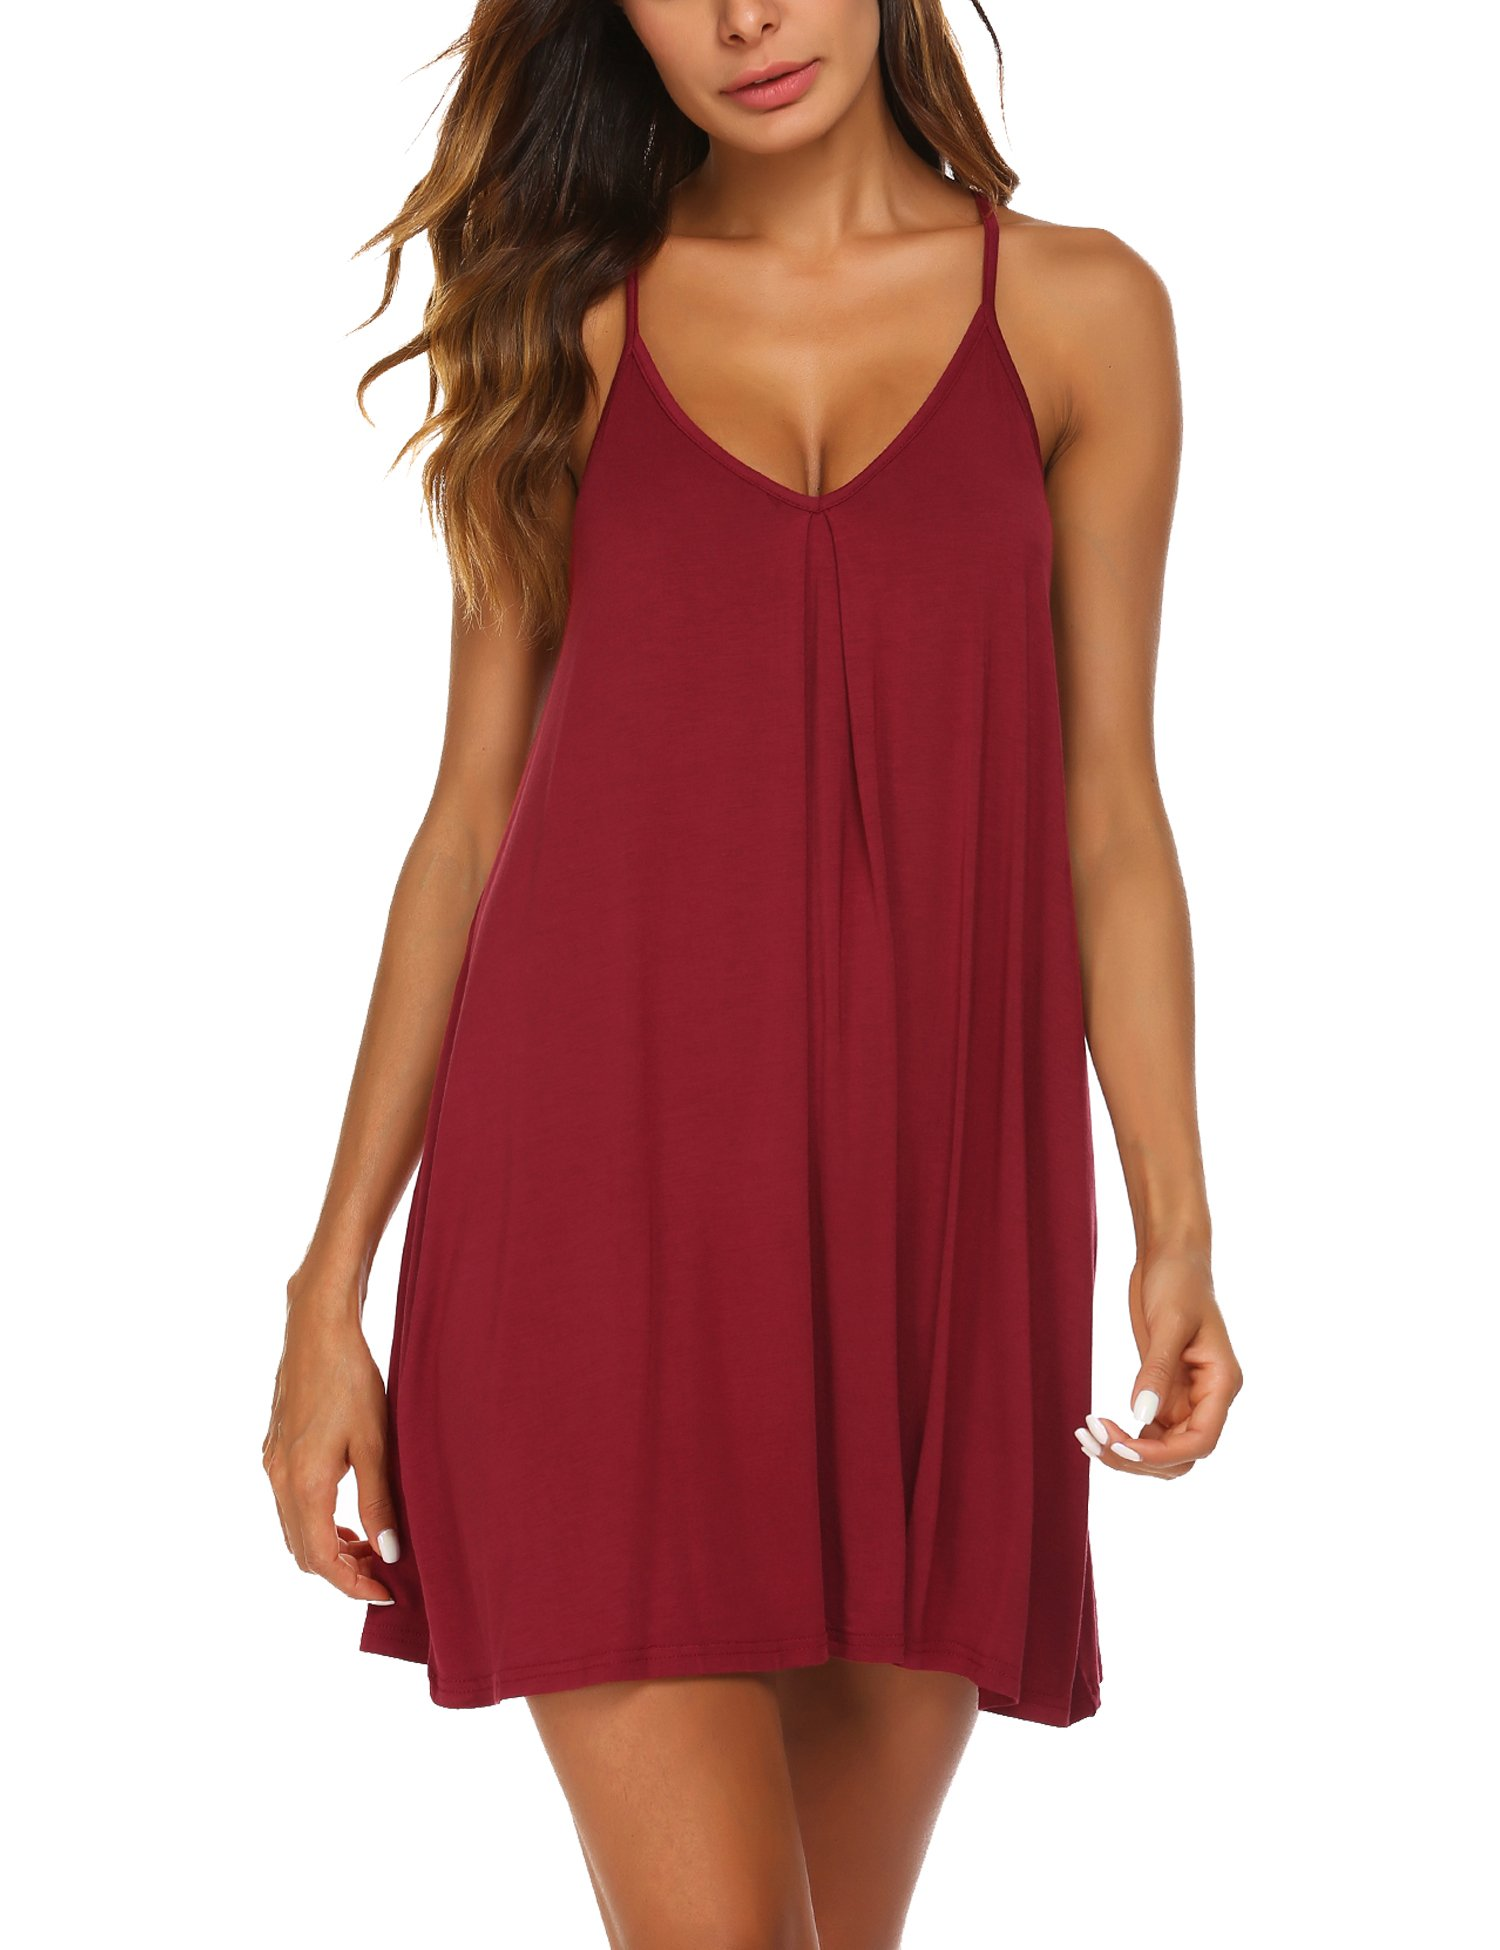 Ekouaer Womens V Neck Sleeveless Nightgown Sleepwear Summer Slip Night Dress S-XXL